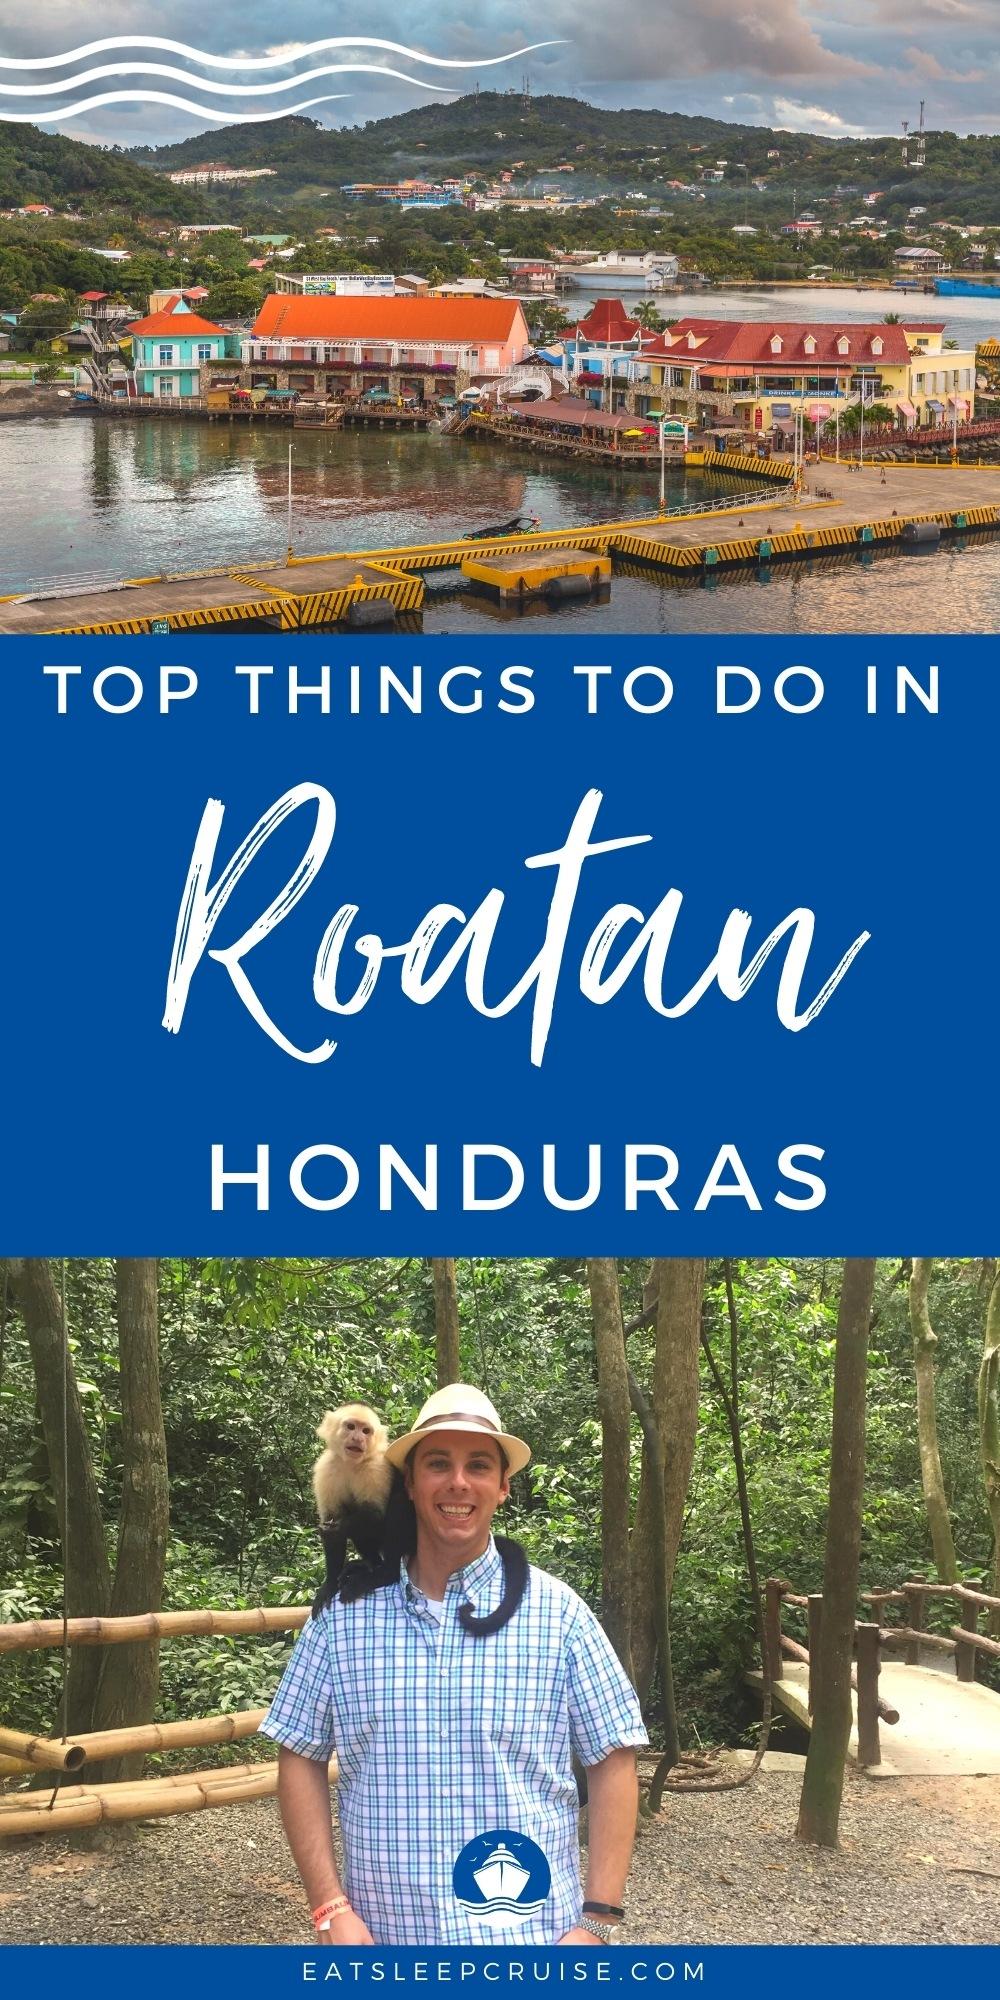 top things to do in Roatan, Honduras on a Cruise